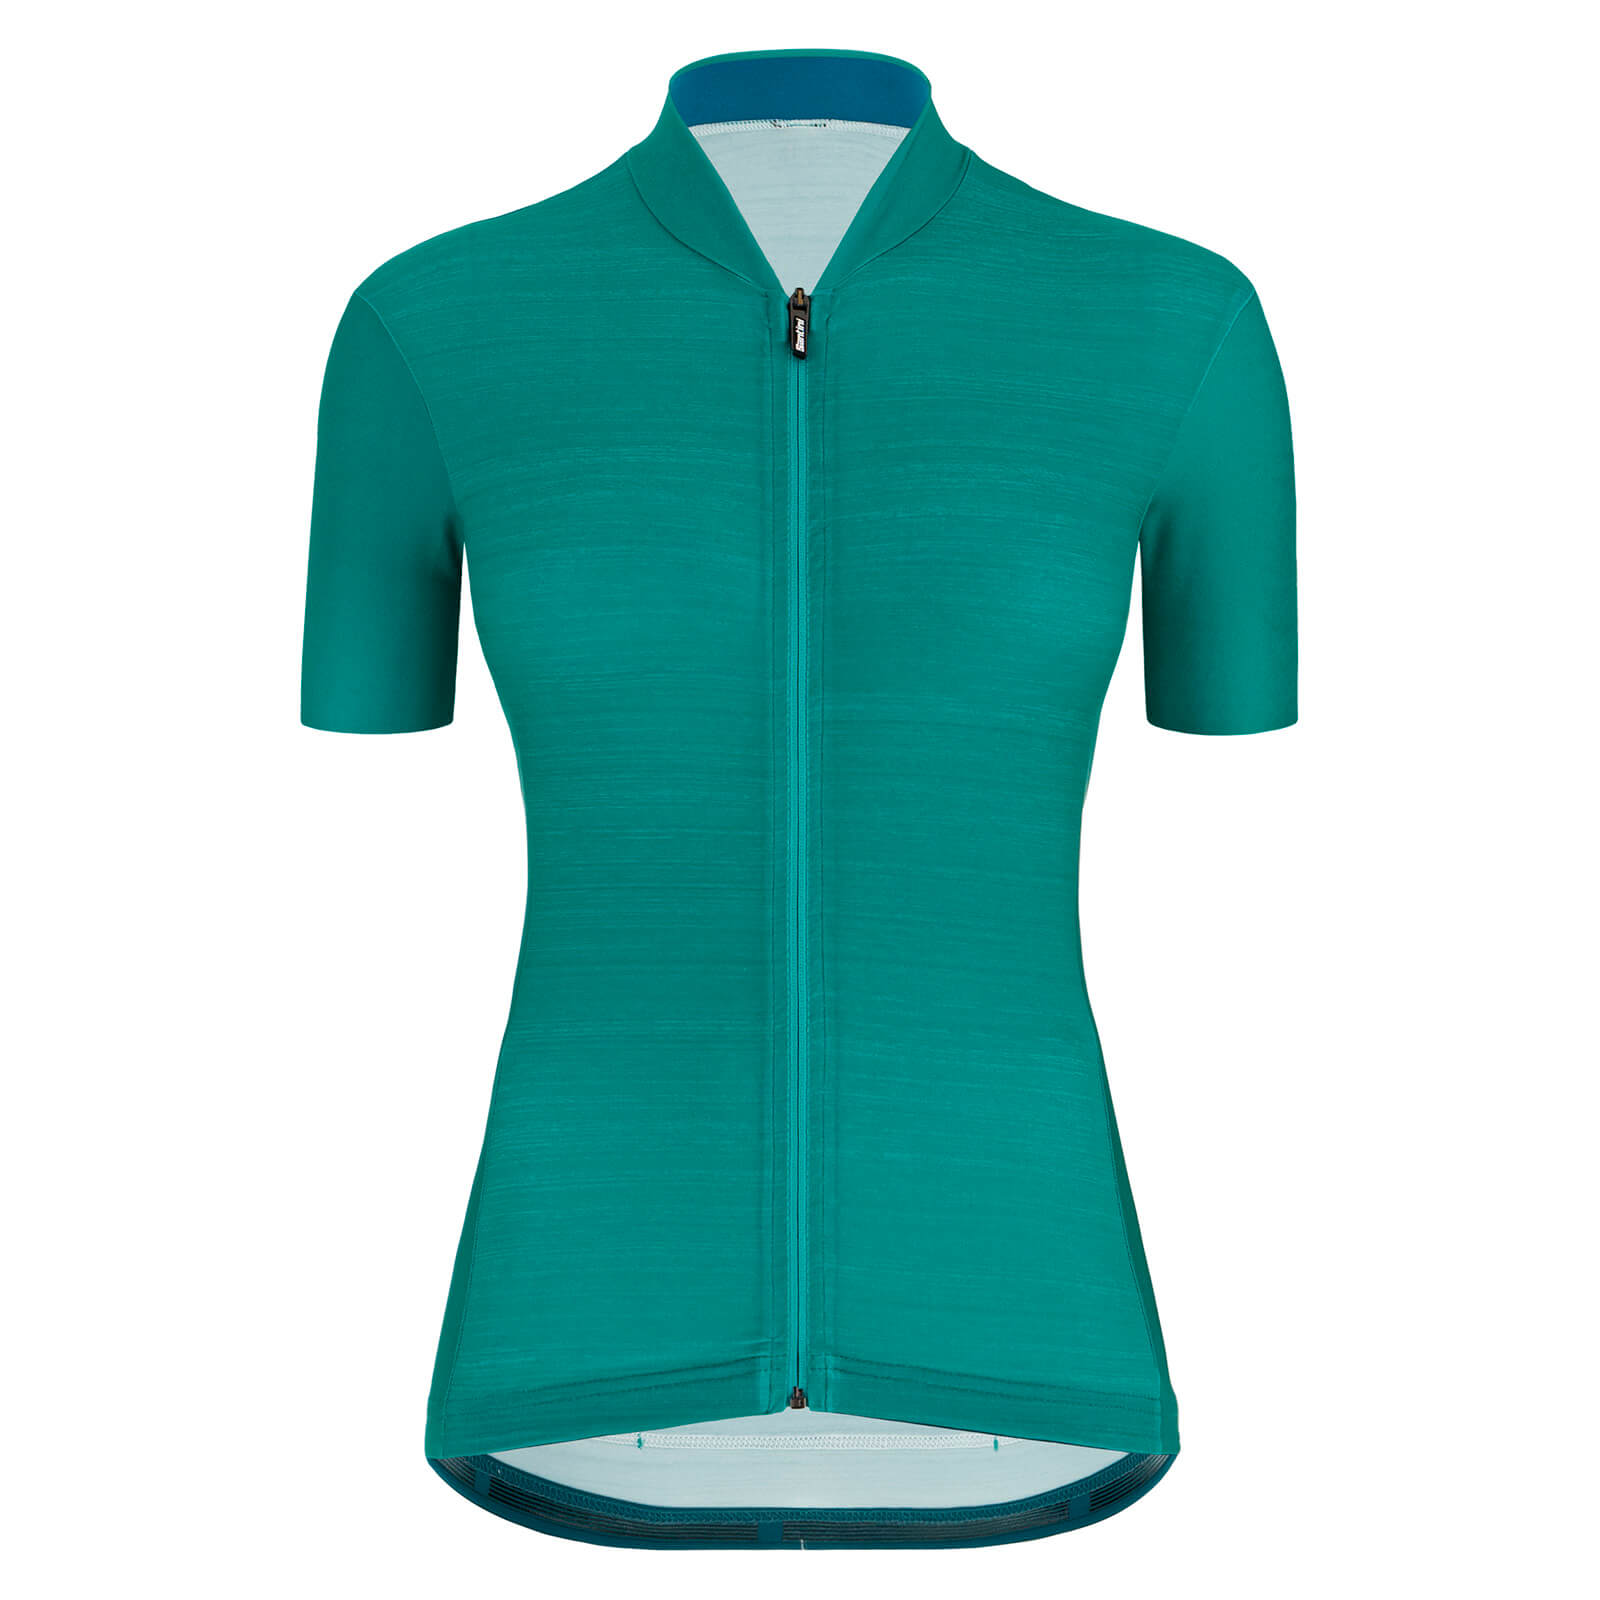 Santini Women's Colore Jersey - L - Petrol Green